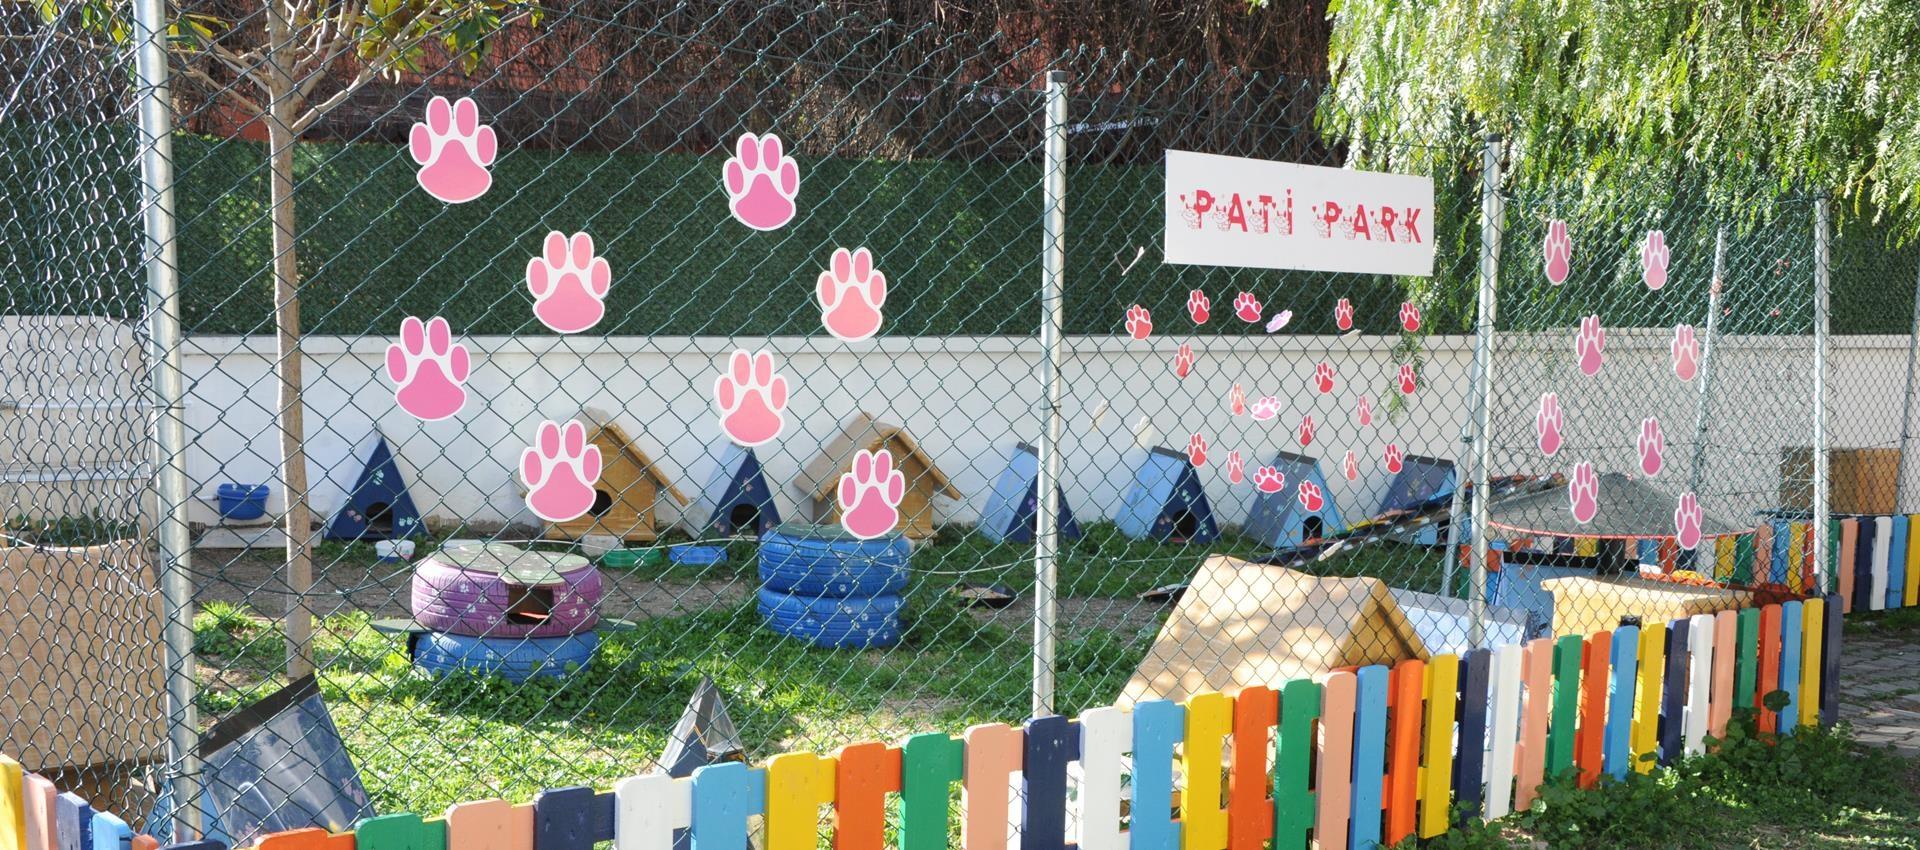 Balçova Pati Park